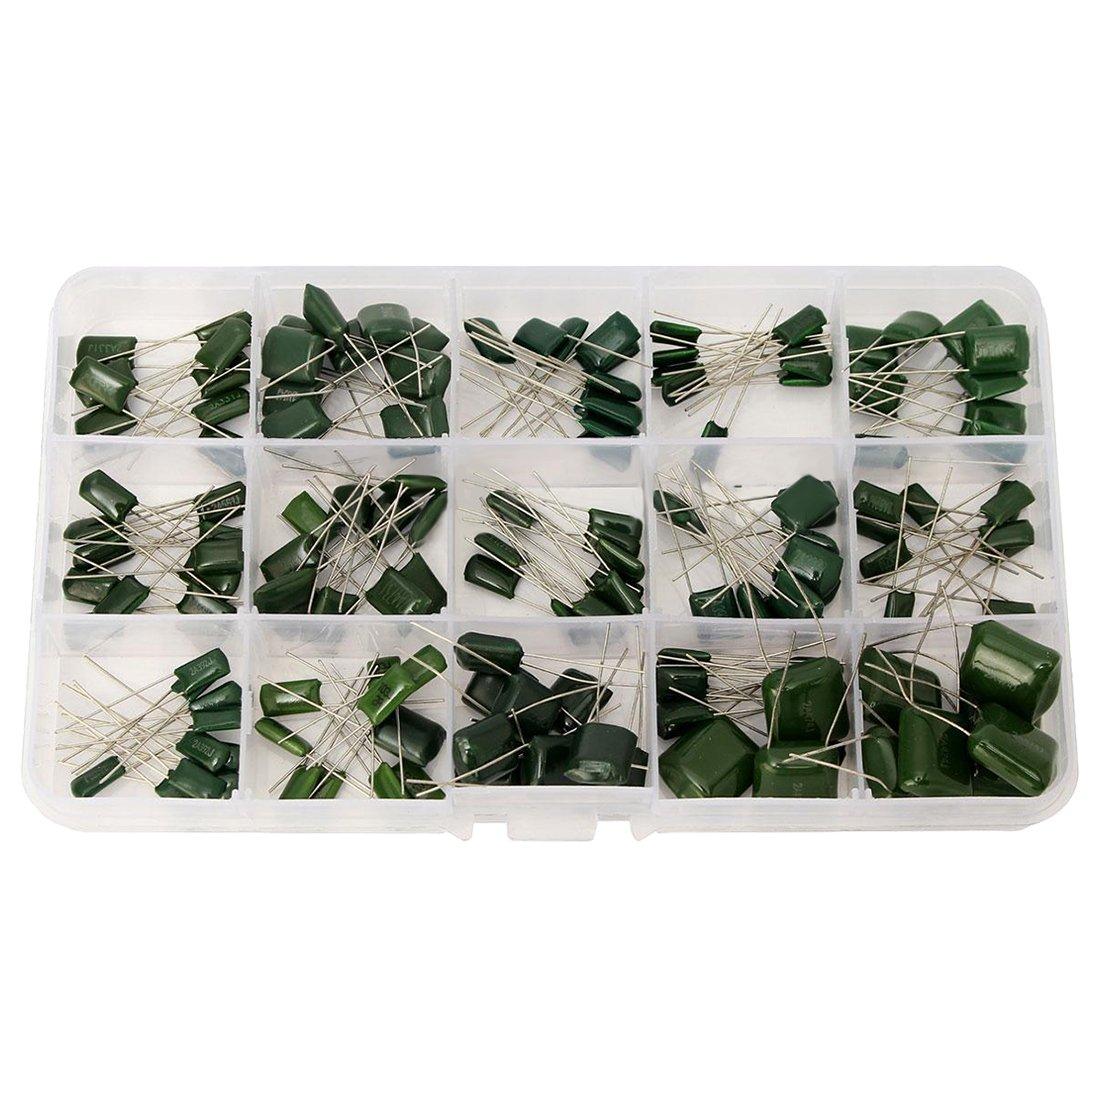 SODIAL(R) 150pcs 100V 15value Polyester Film Capacitor Assorted Kit Box Assorstment